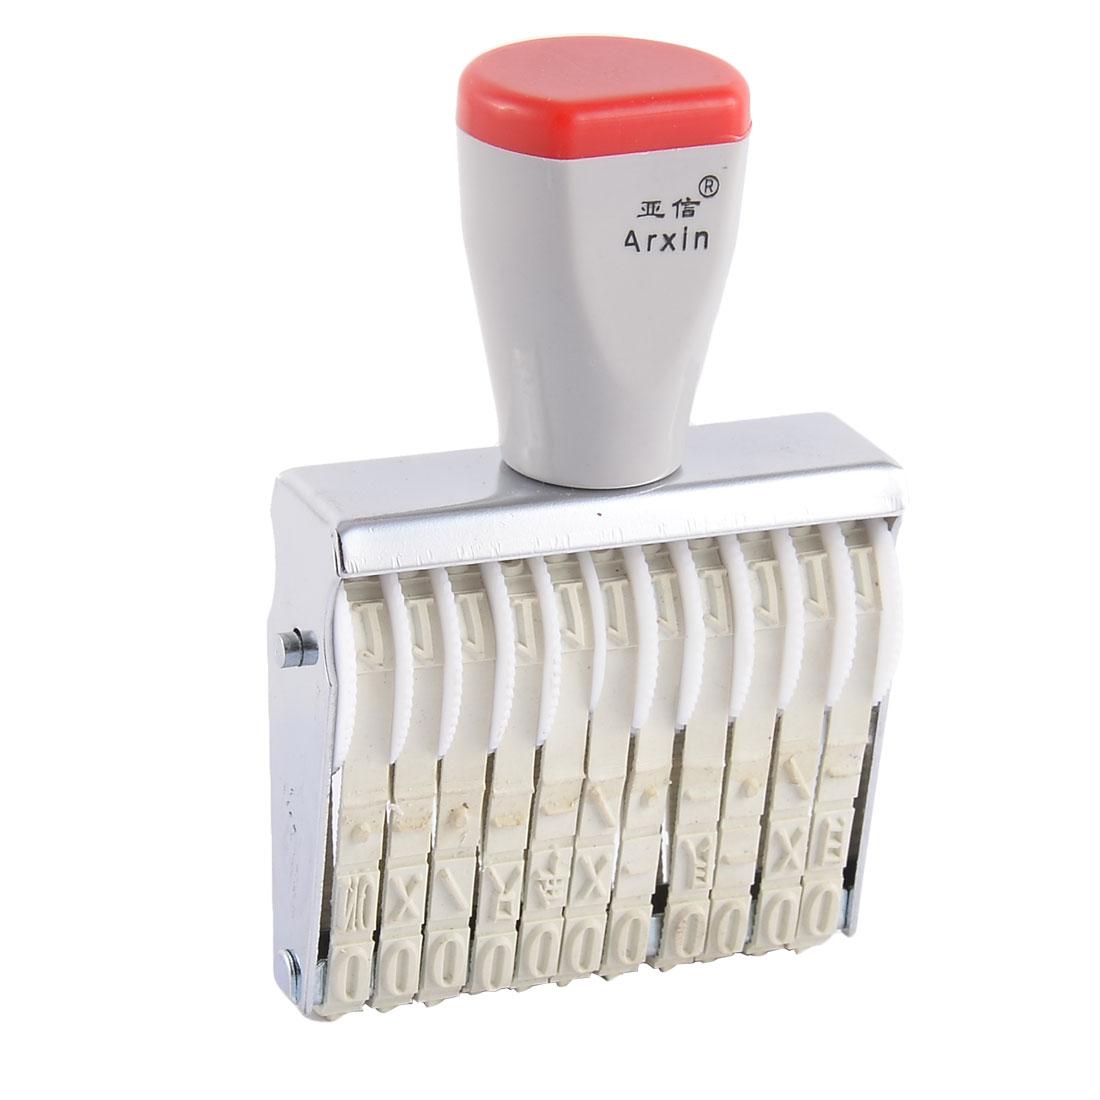 Office Supermarket 10 Digit Rubber Band Wheel Number Date Printing Stamp Printer